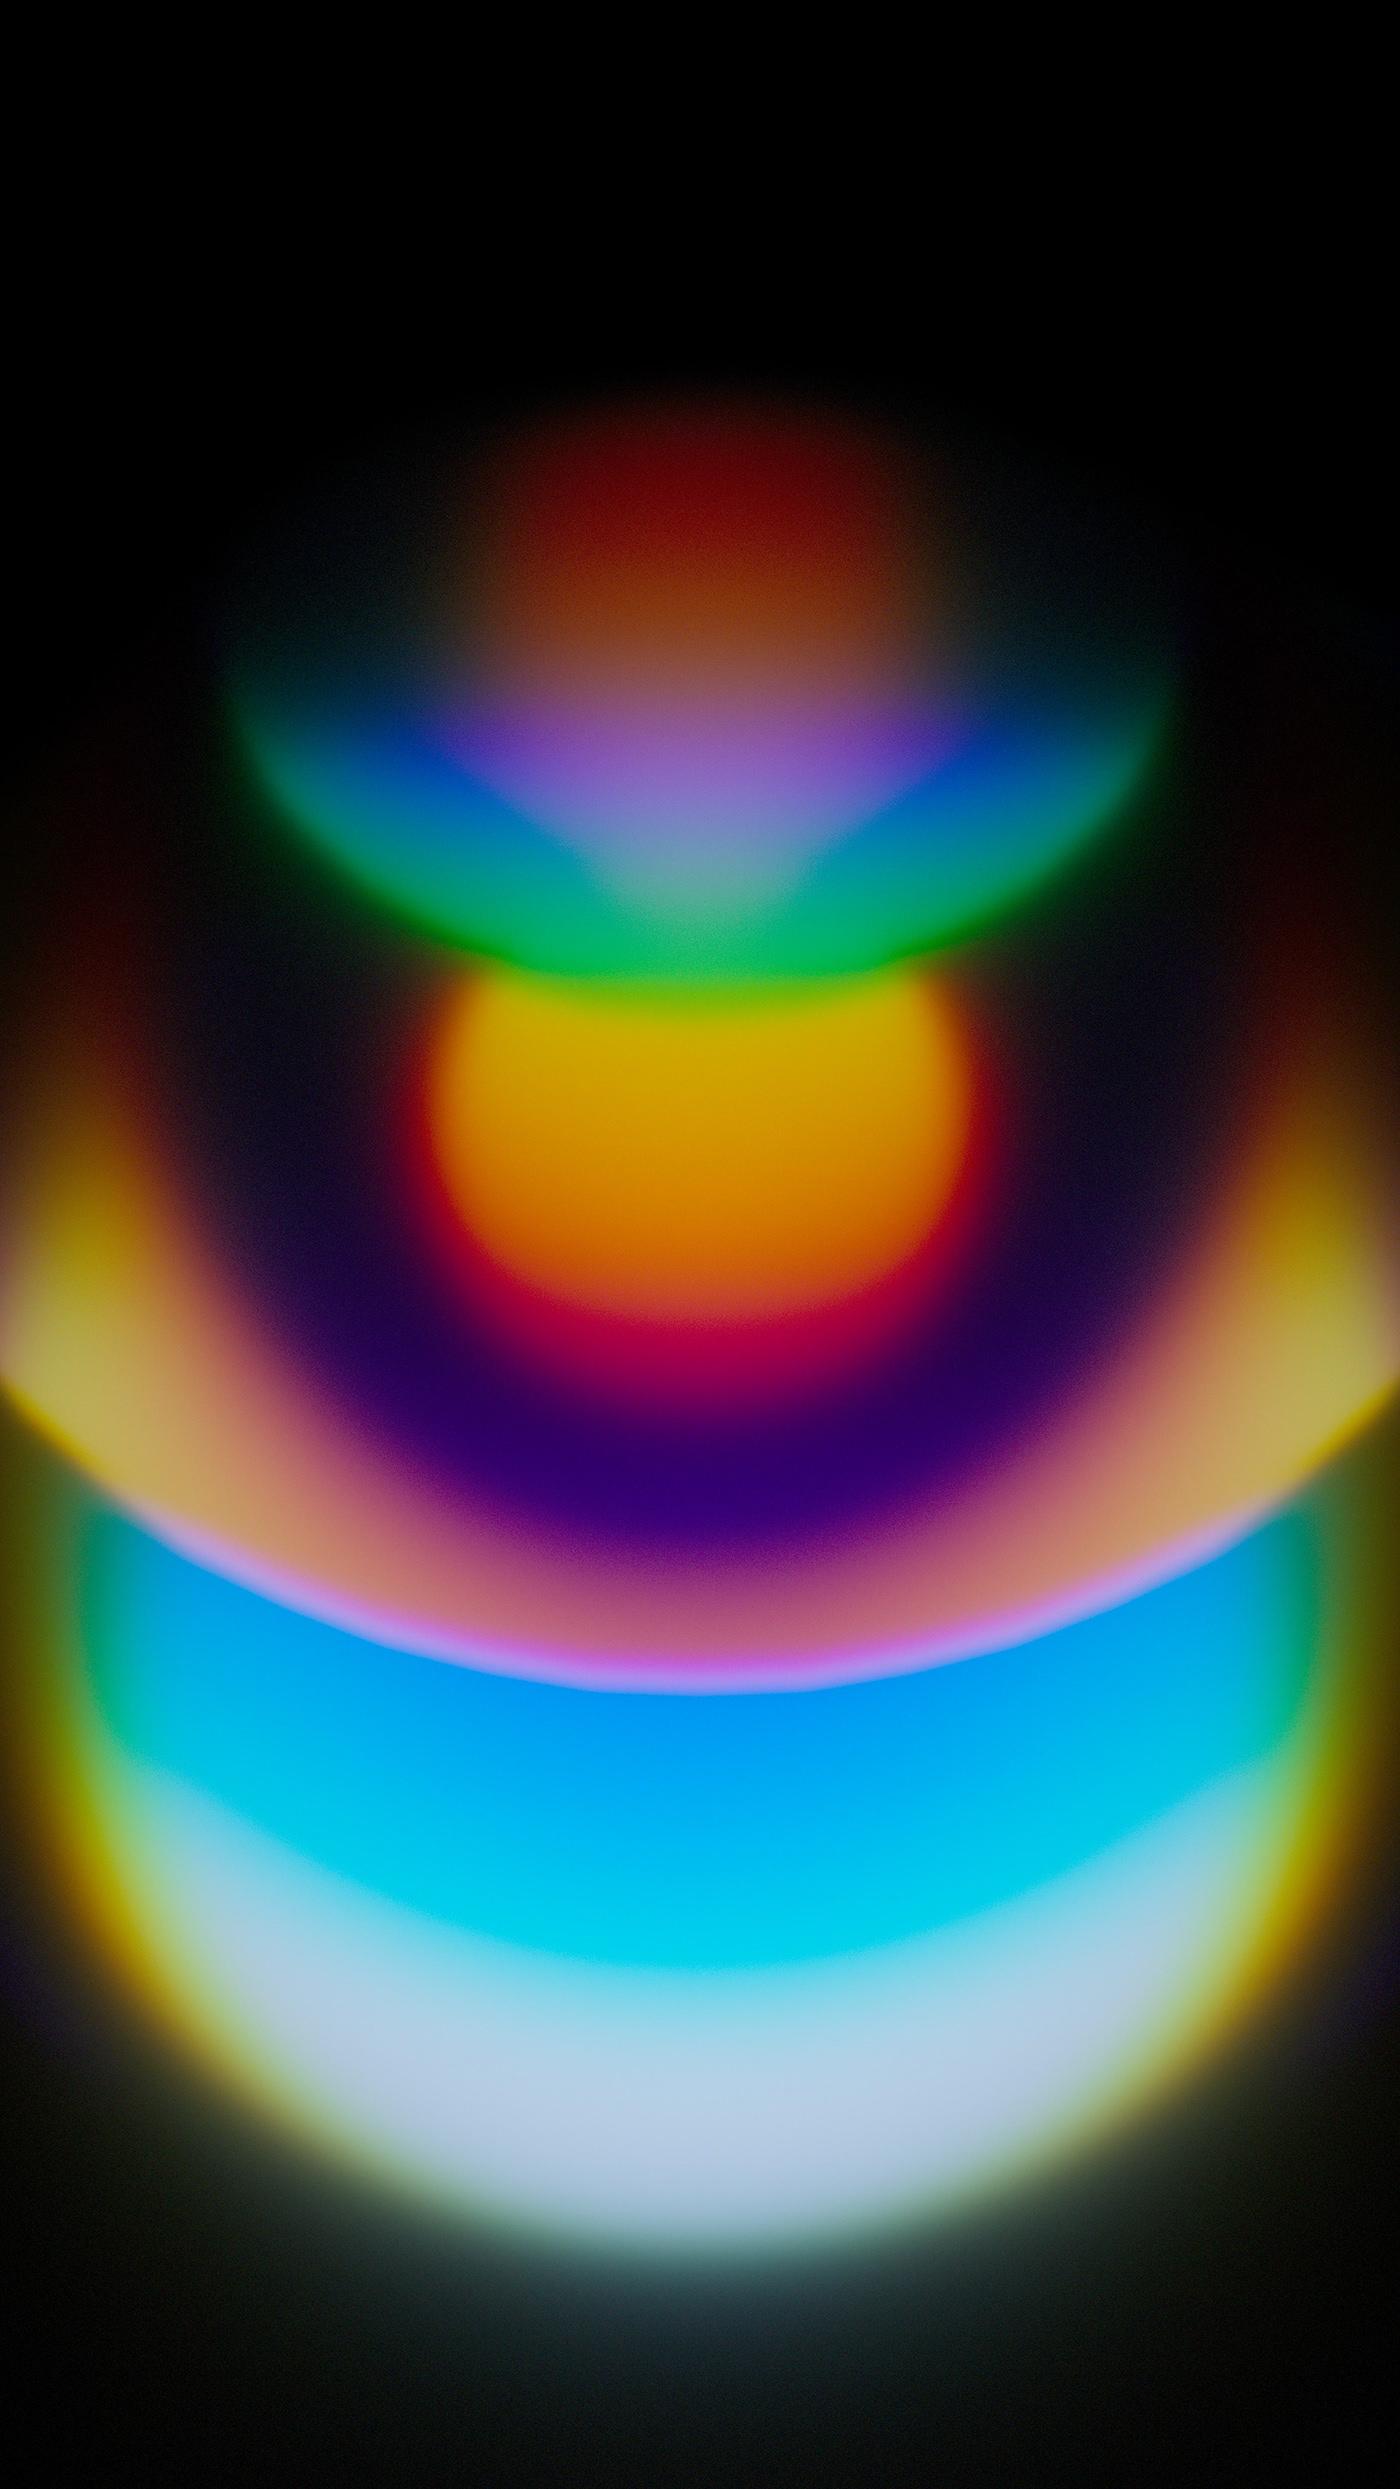 Image may contain: colorfulness and screenshot